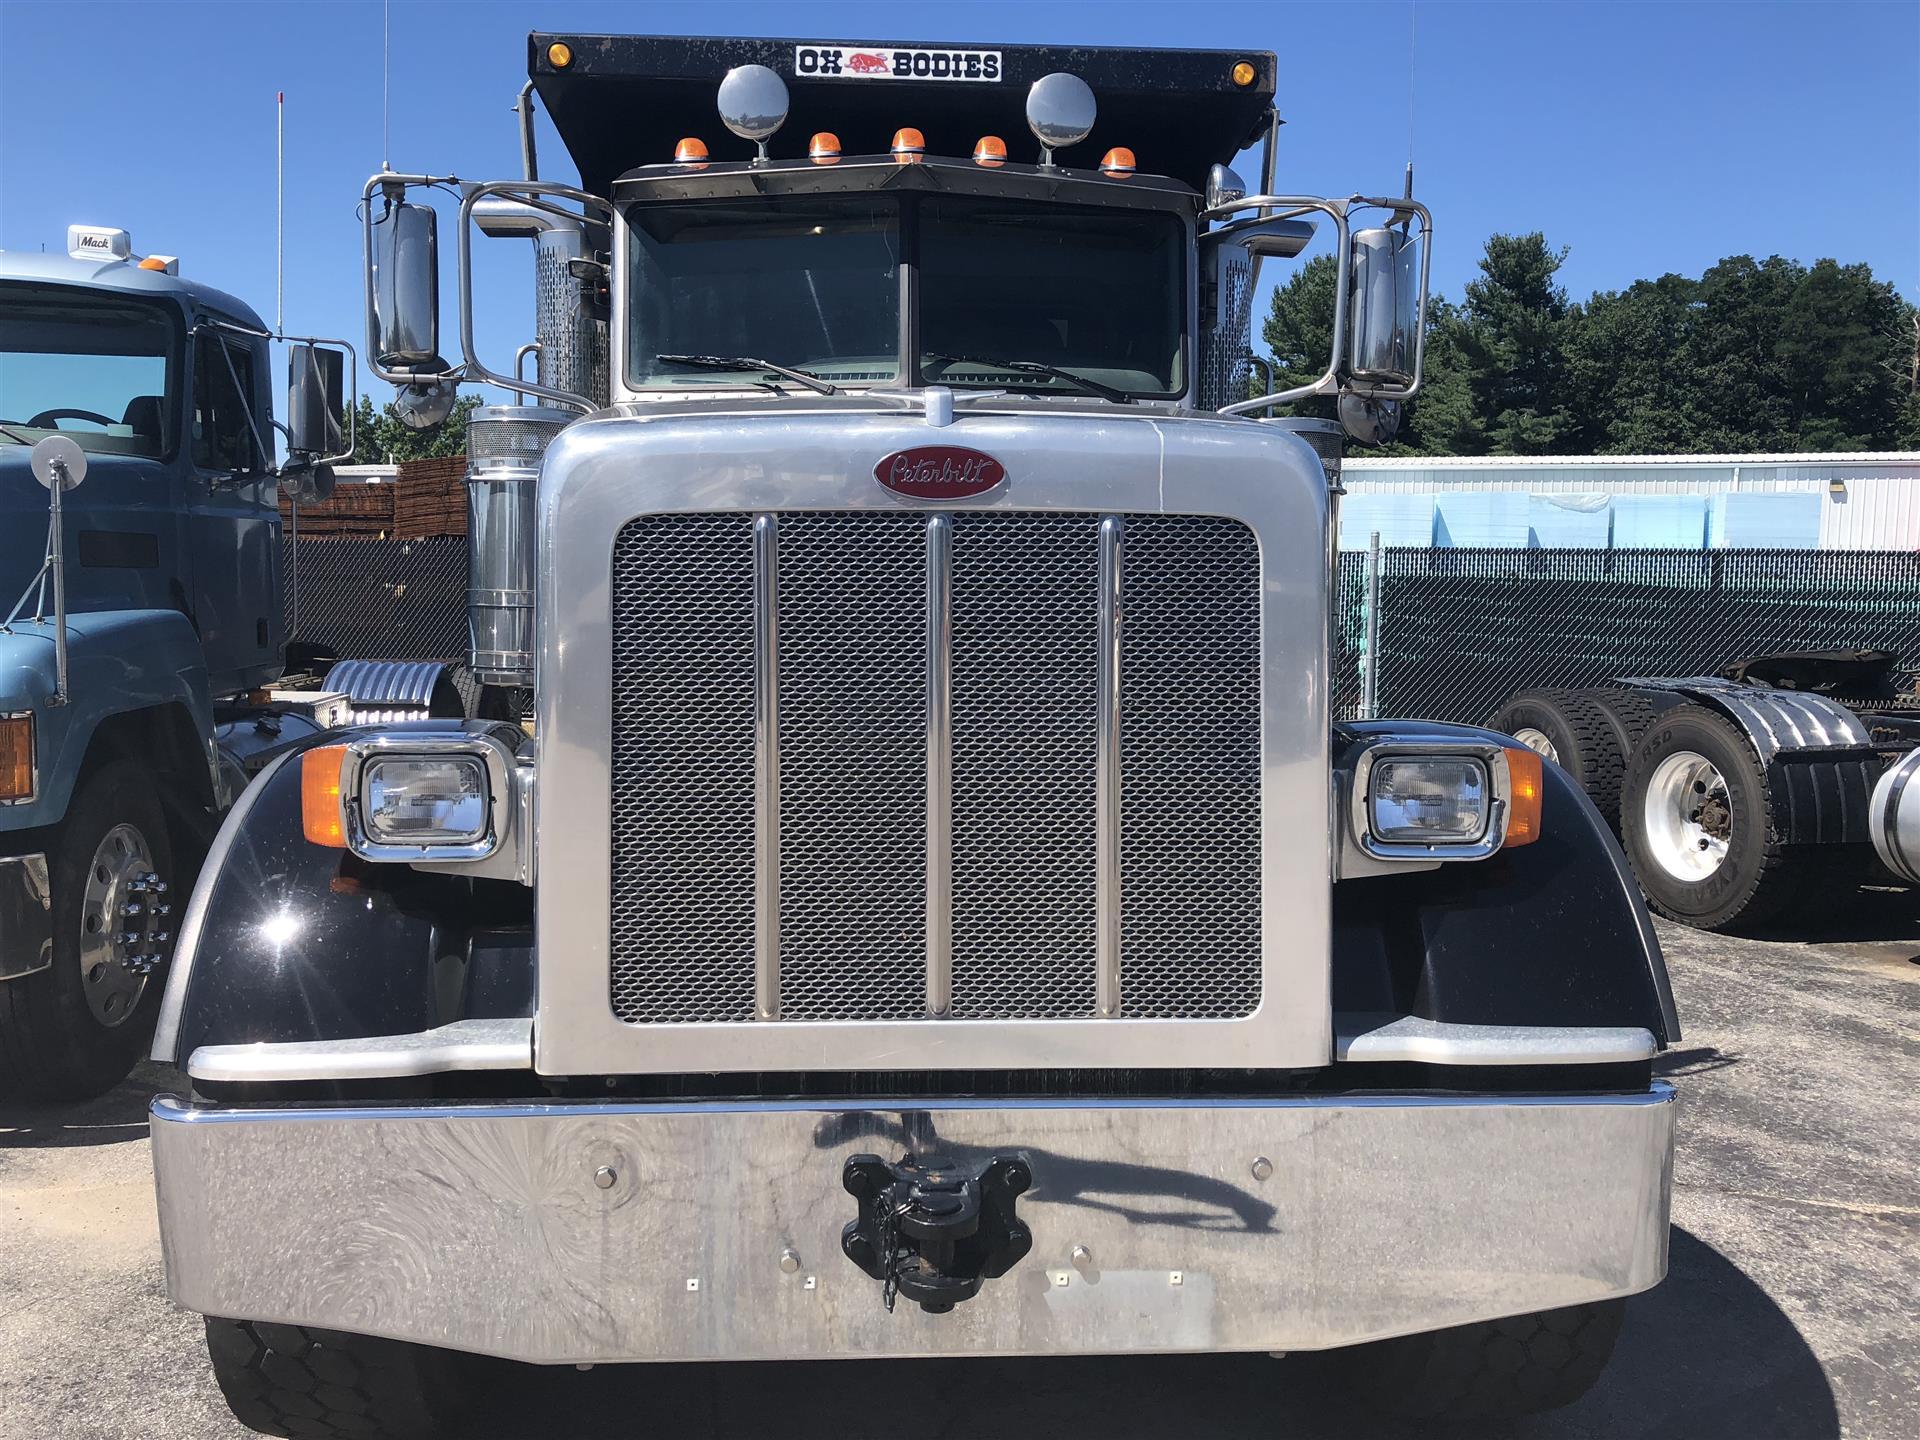 Dump Trucks | View All Dump Trucks For Sale | Truck Buyers Guide